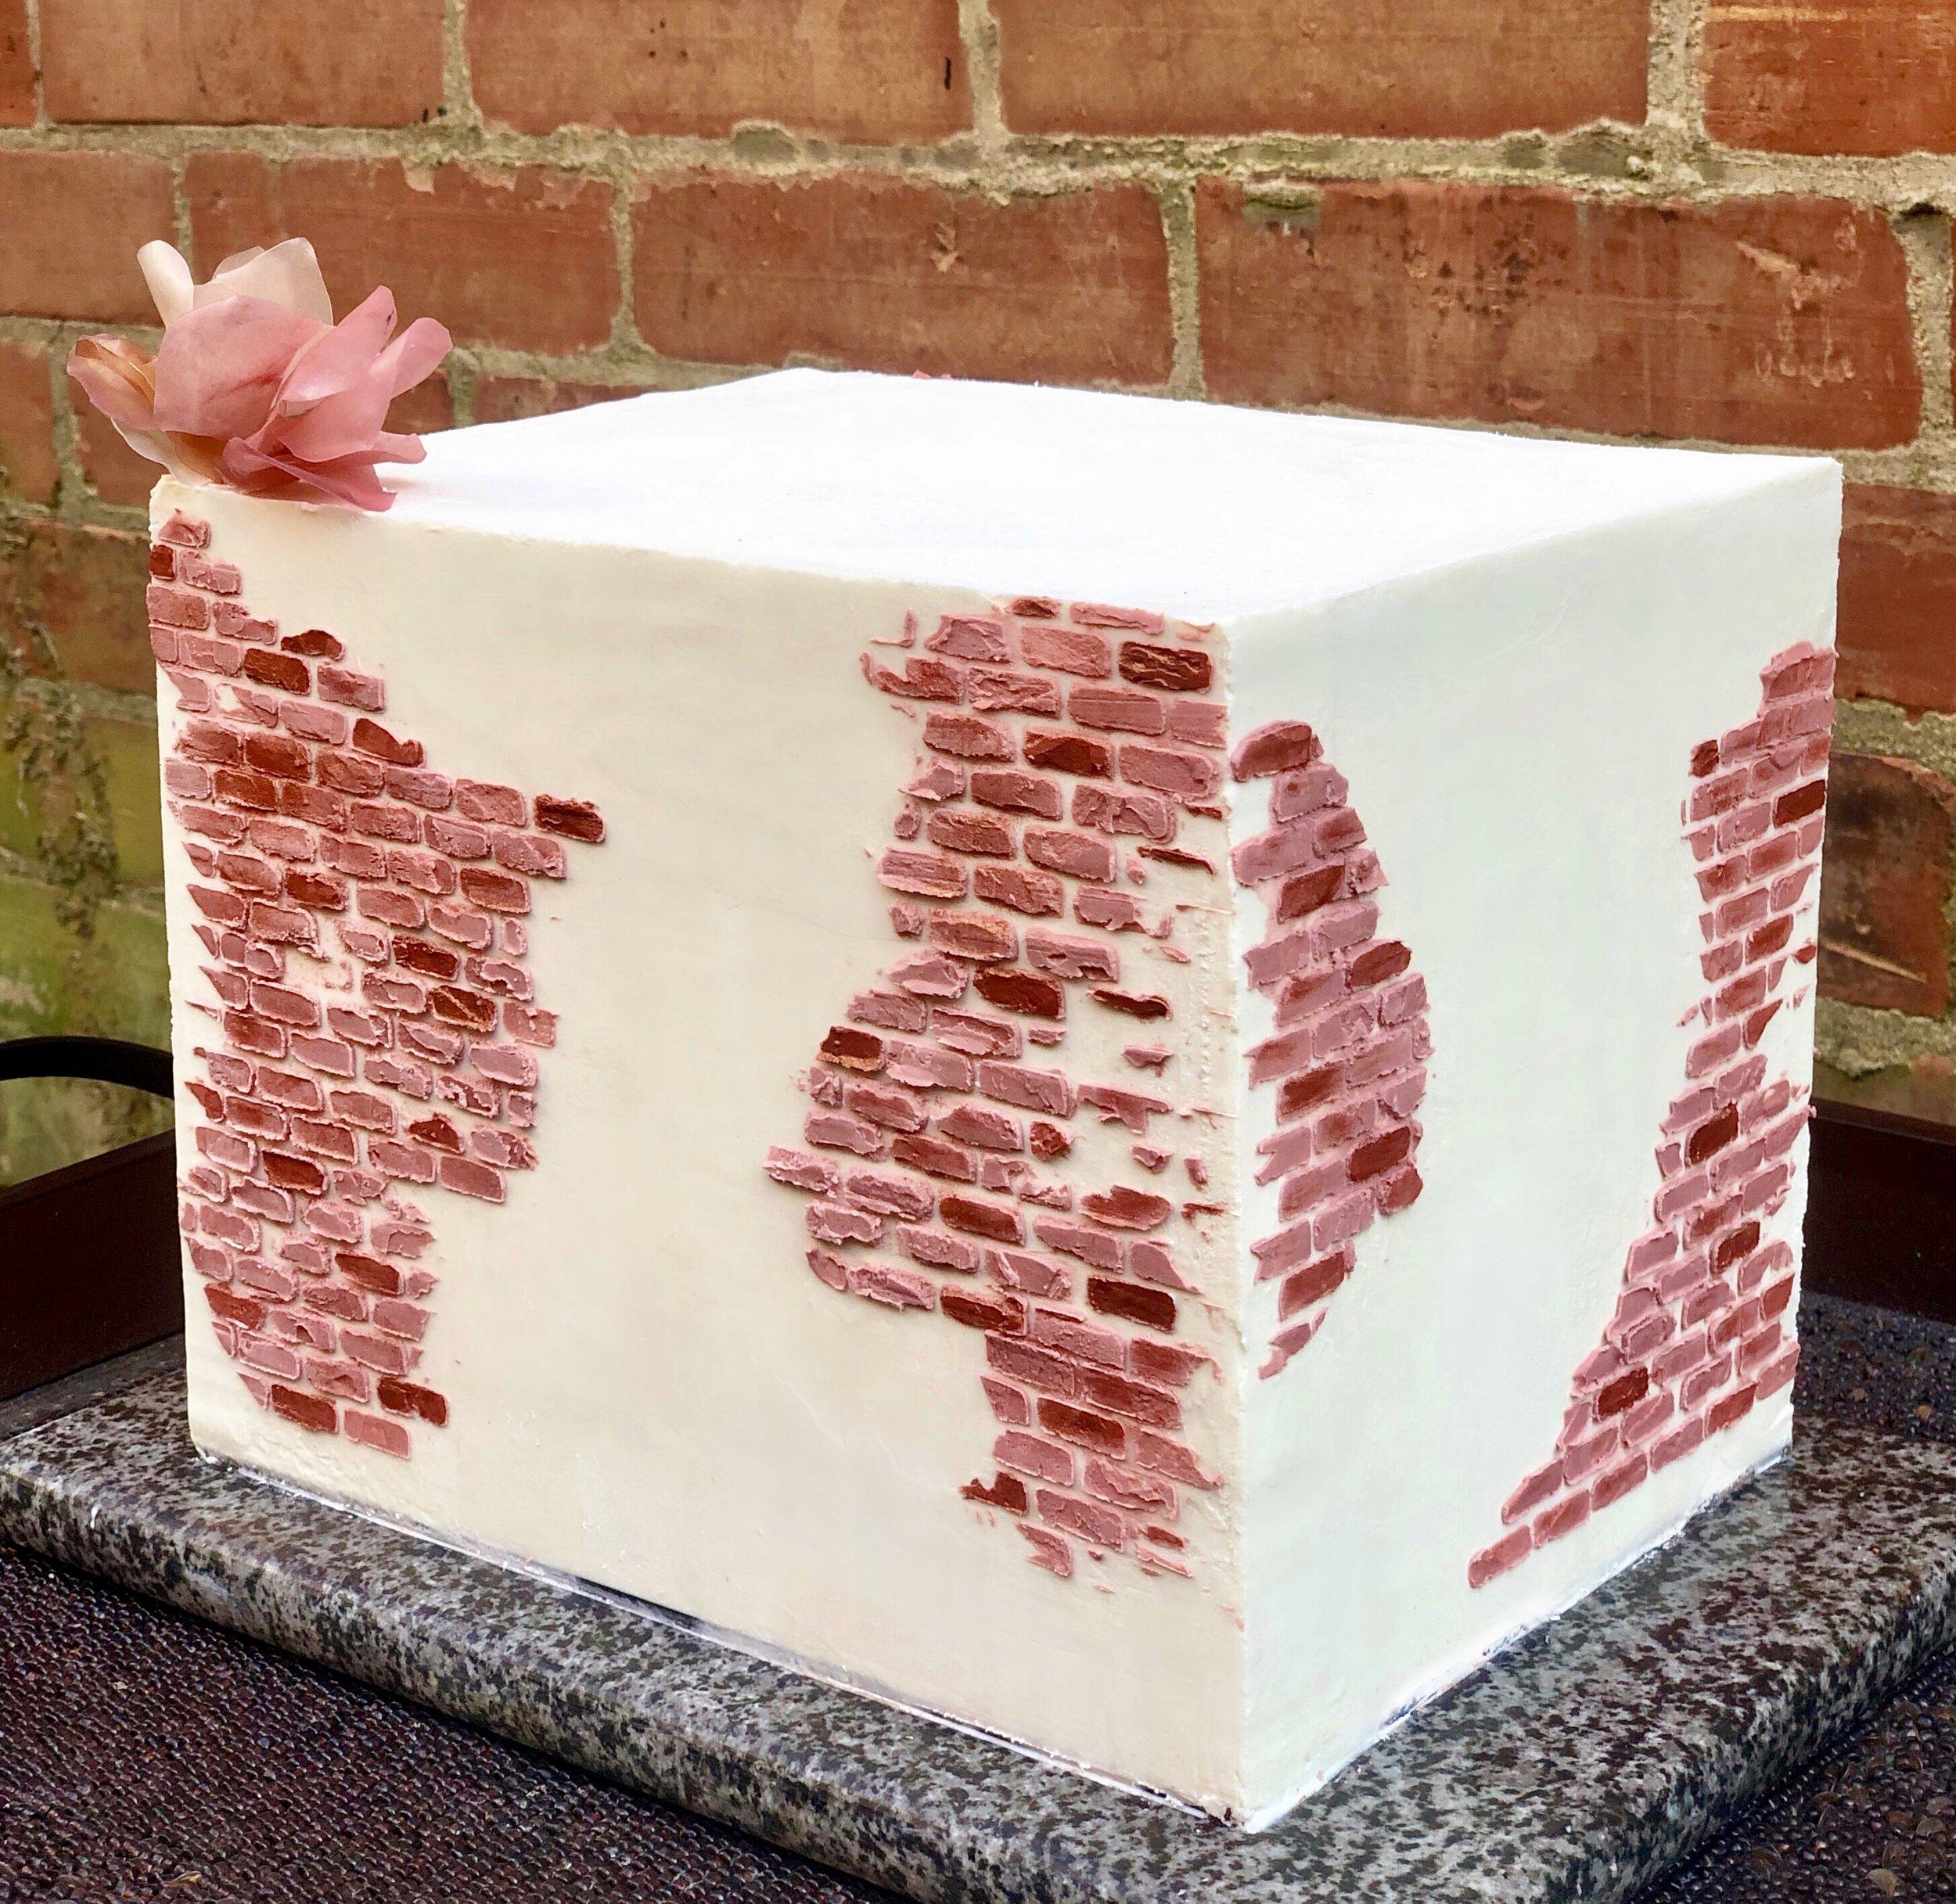 Brick cake.jpg